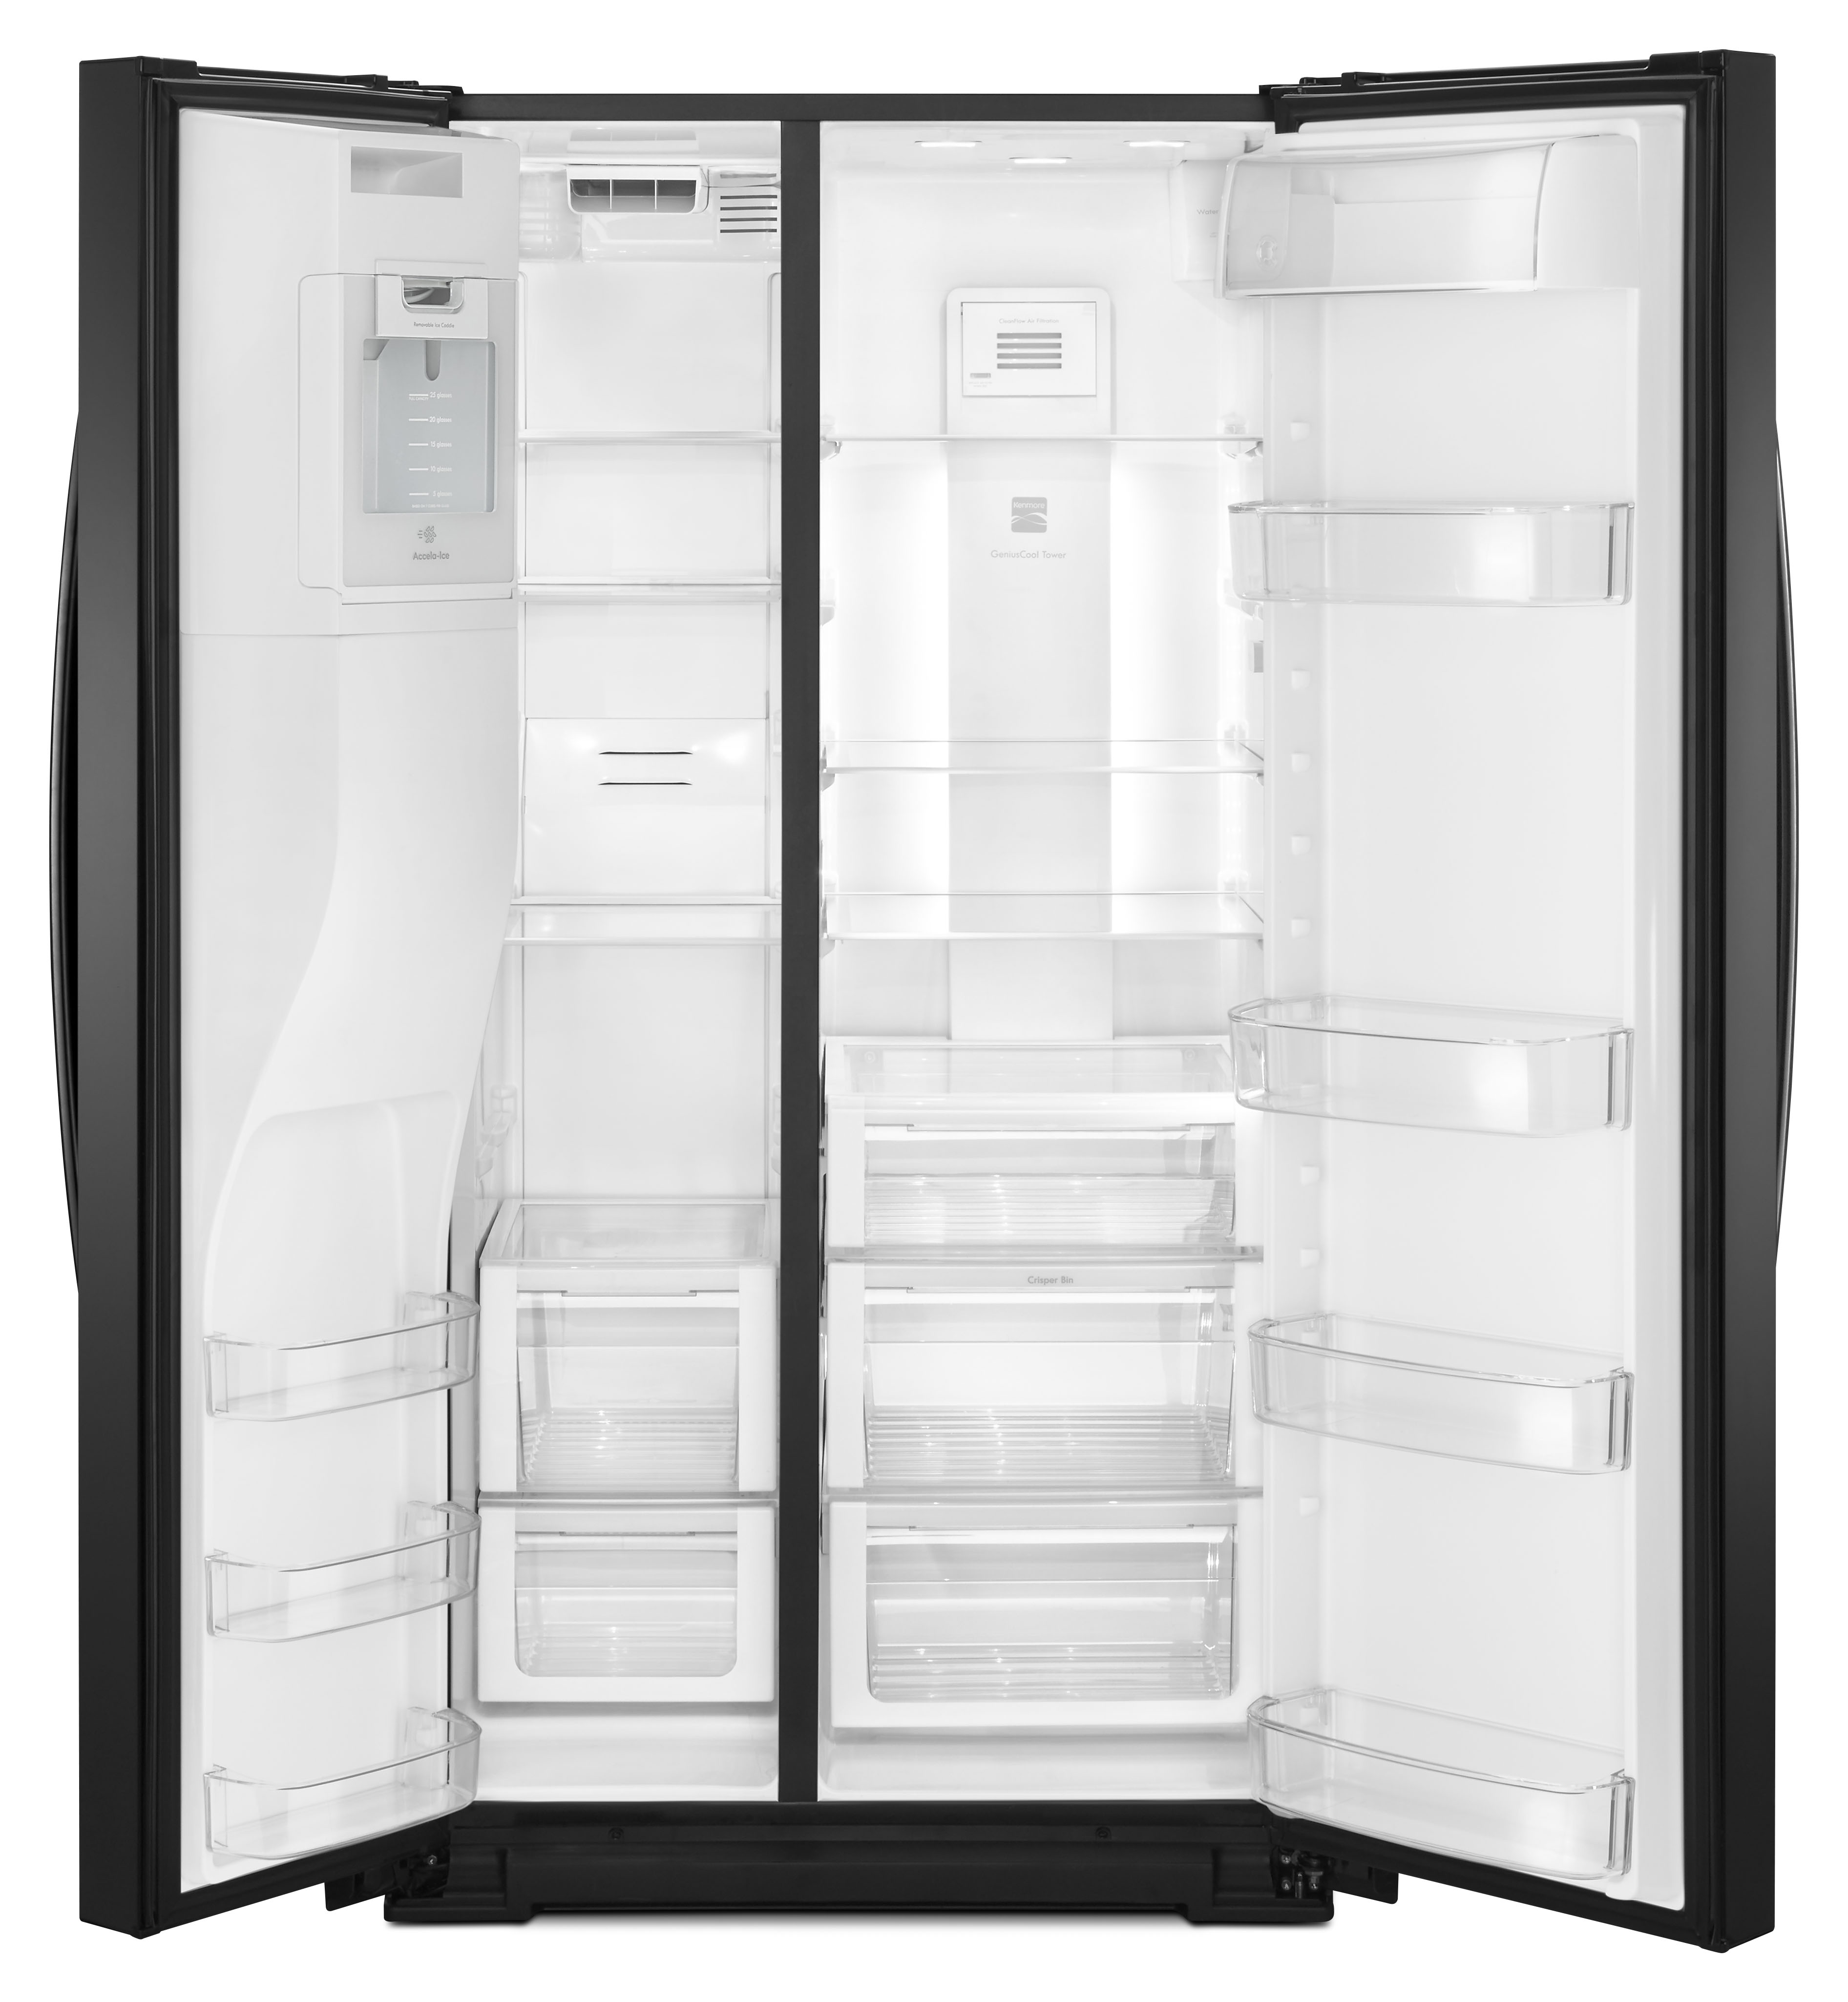 Kenmore 51769 25 cu. ft. Side-by-Side Refrigerator - Black